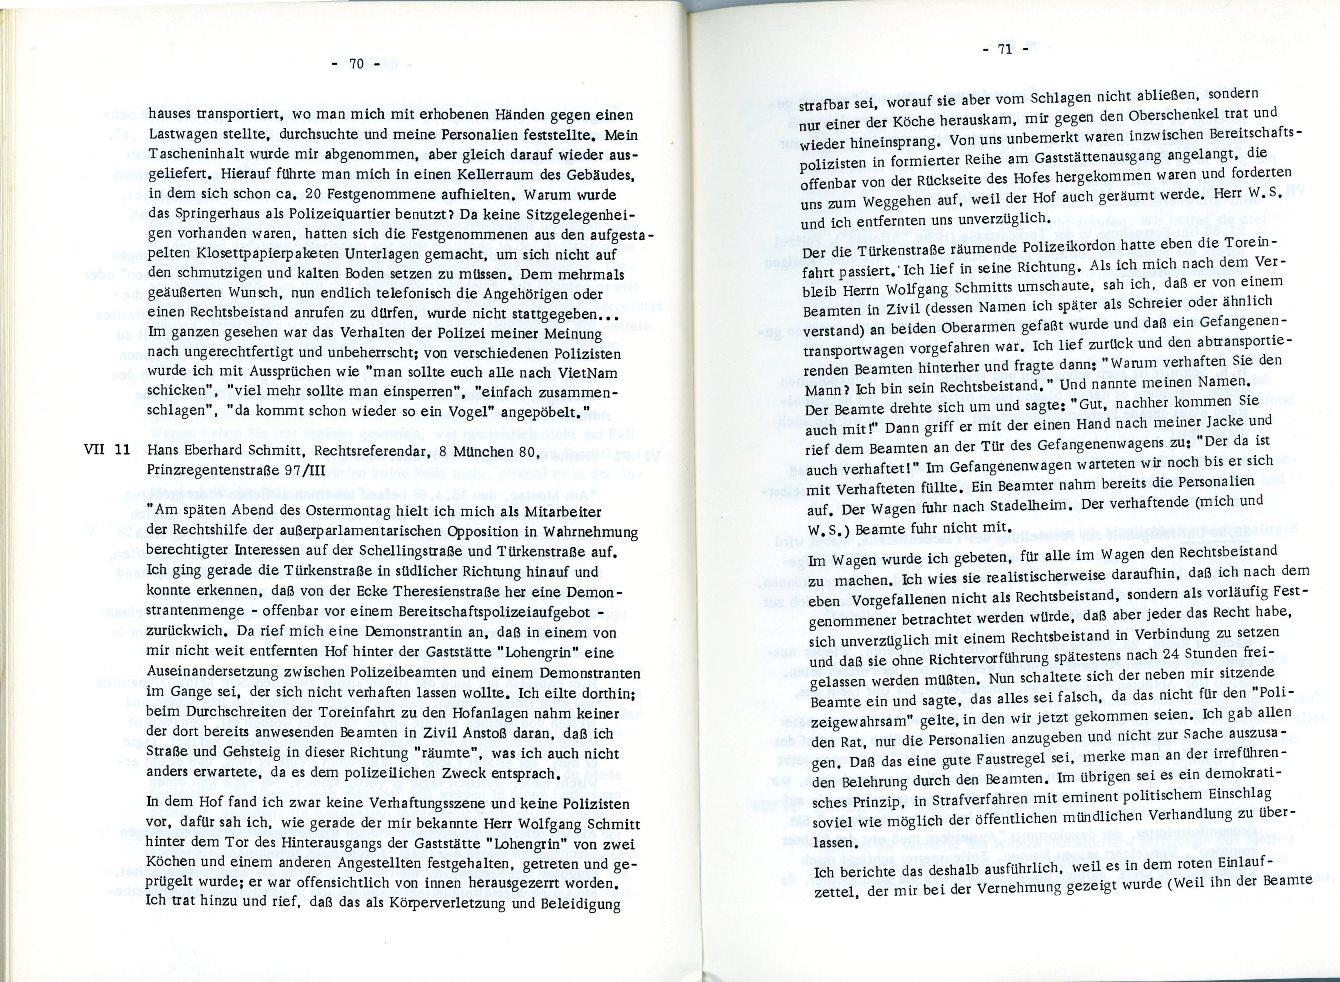 Muenchen_Doku_Osterdemonstrationen_1968_38